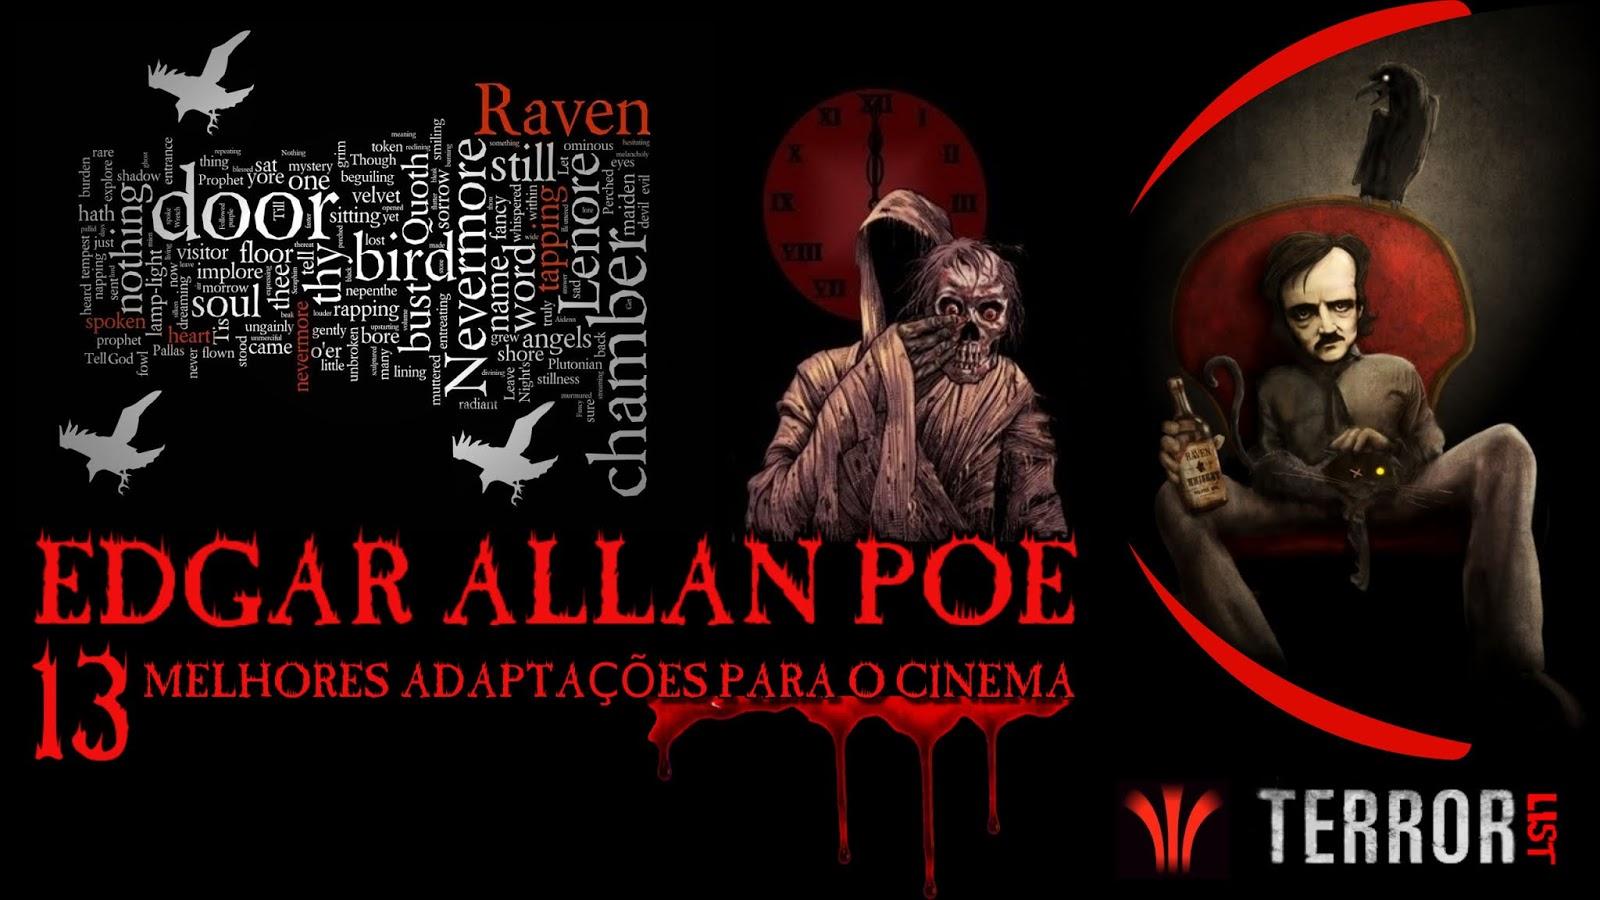 edgar-allan-poe-13-melhores-adaptacoes